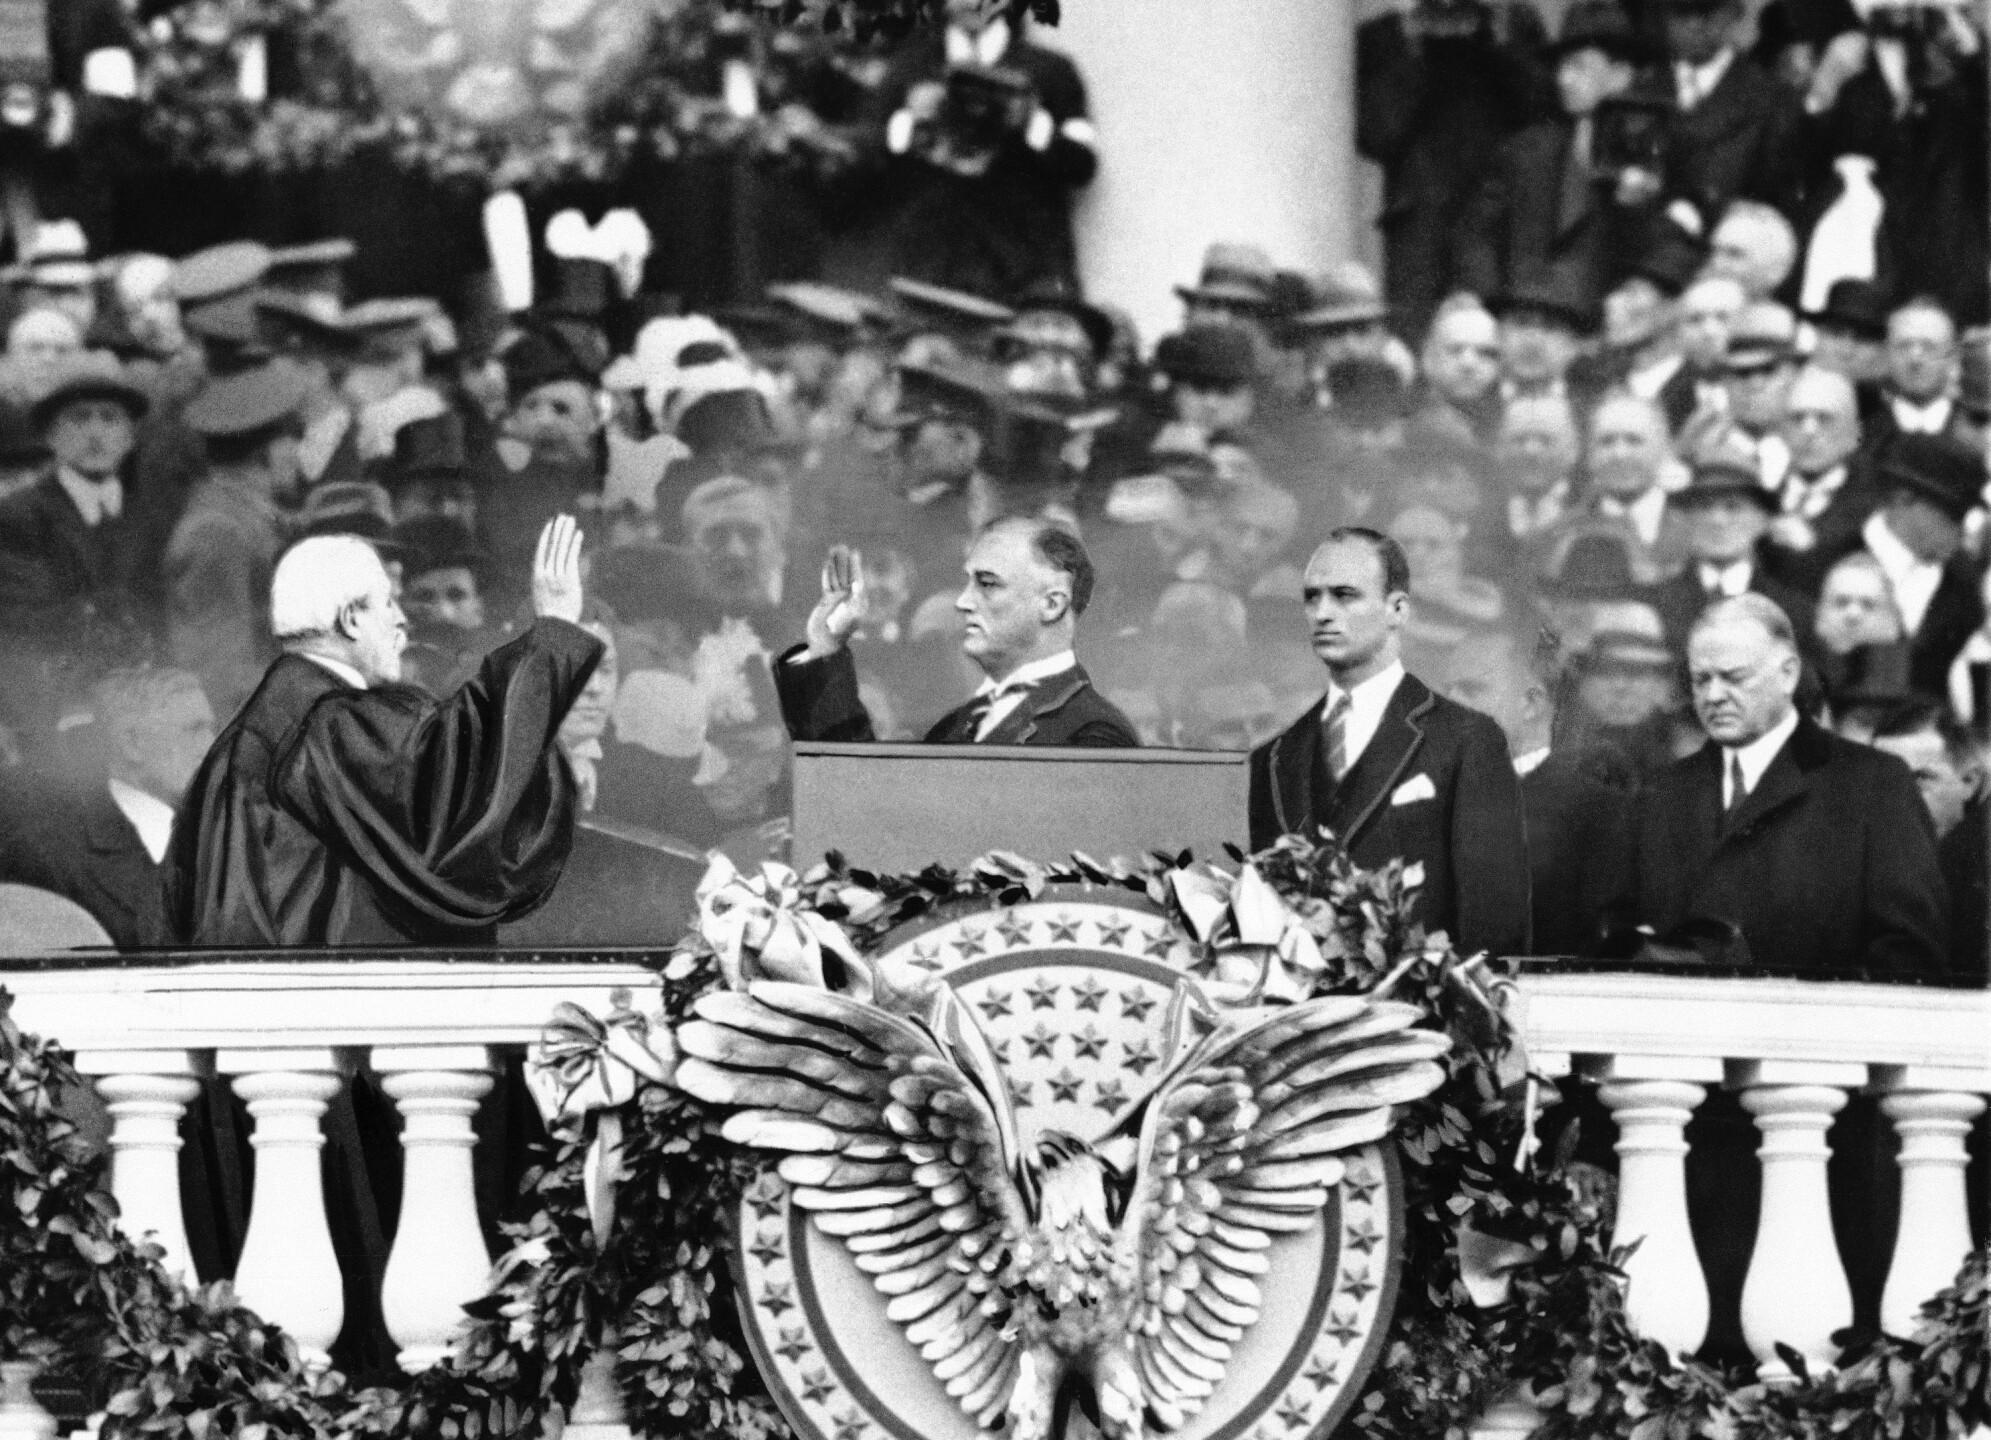 Franklin D. Roosevelt, Charles E. Hughes, Herbert Hoover, James Roosevelt